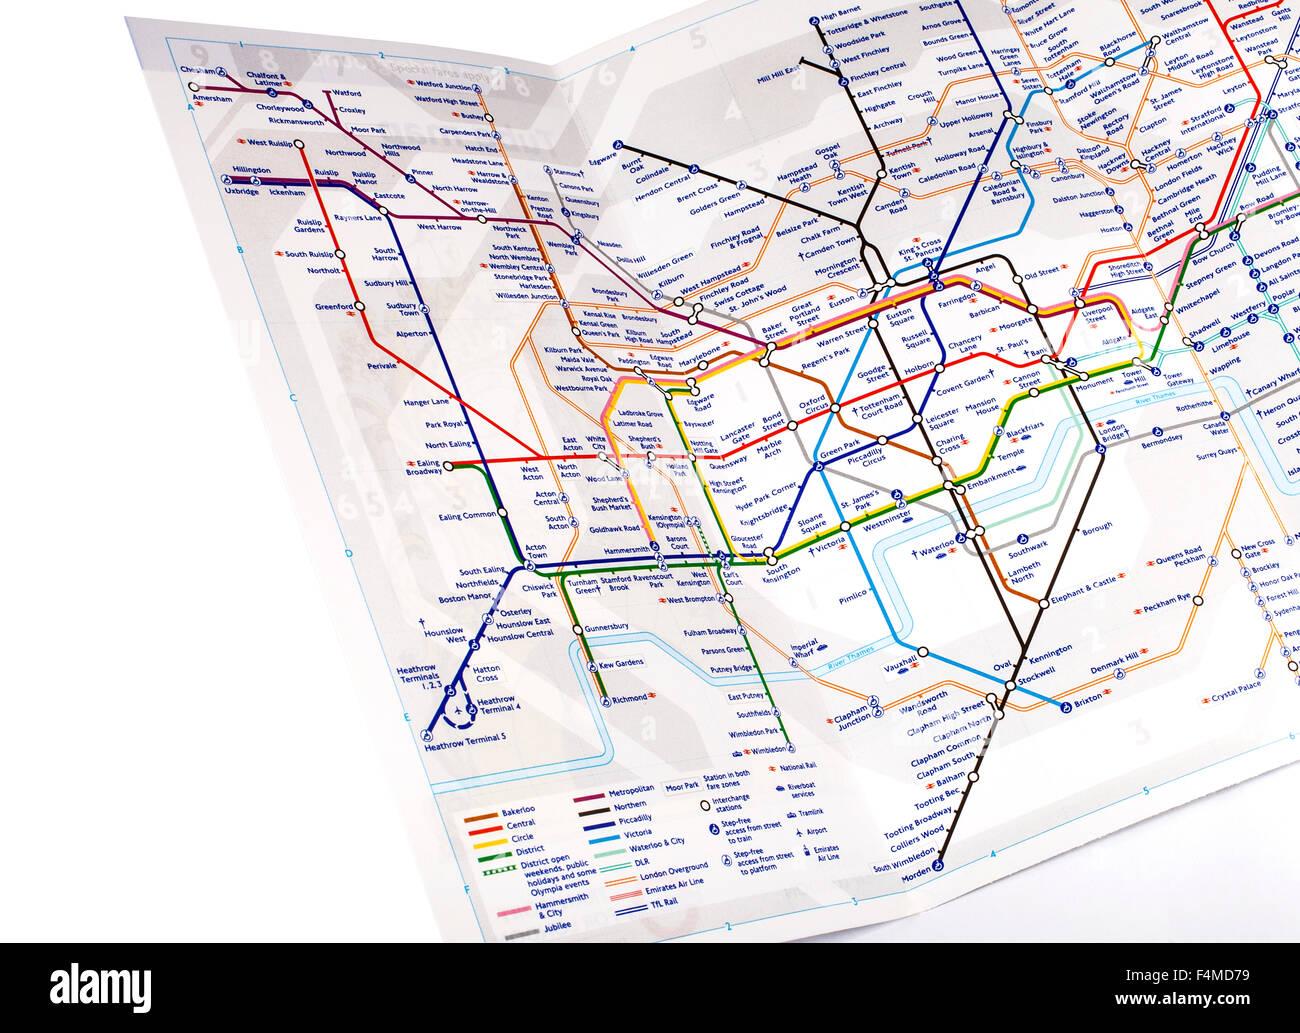 Map Subway London.London Subway Map Stock Photos London Subway Map Stock Images Alamy